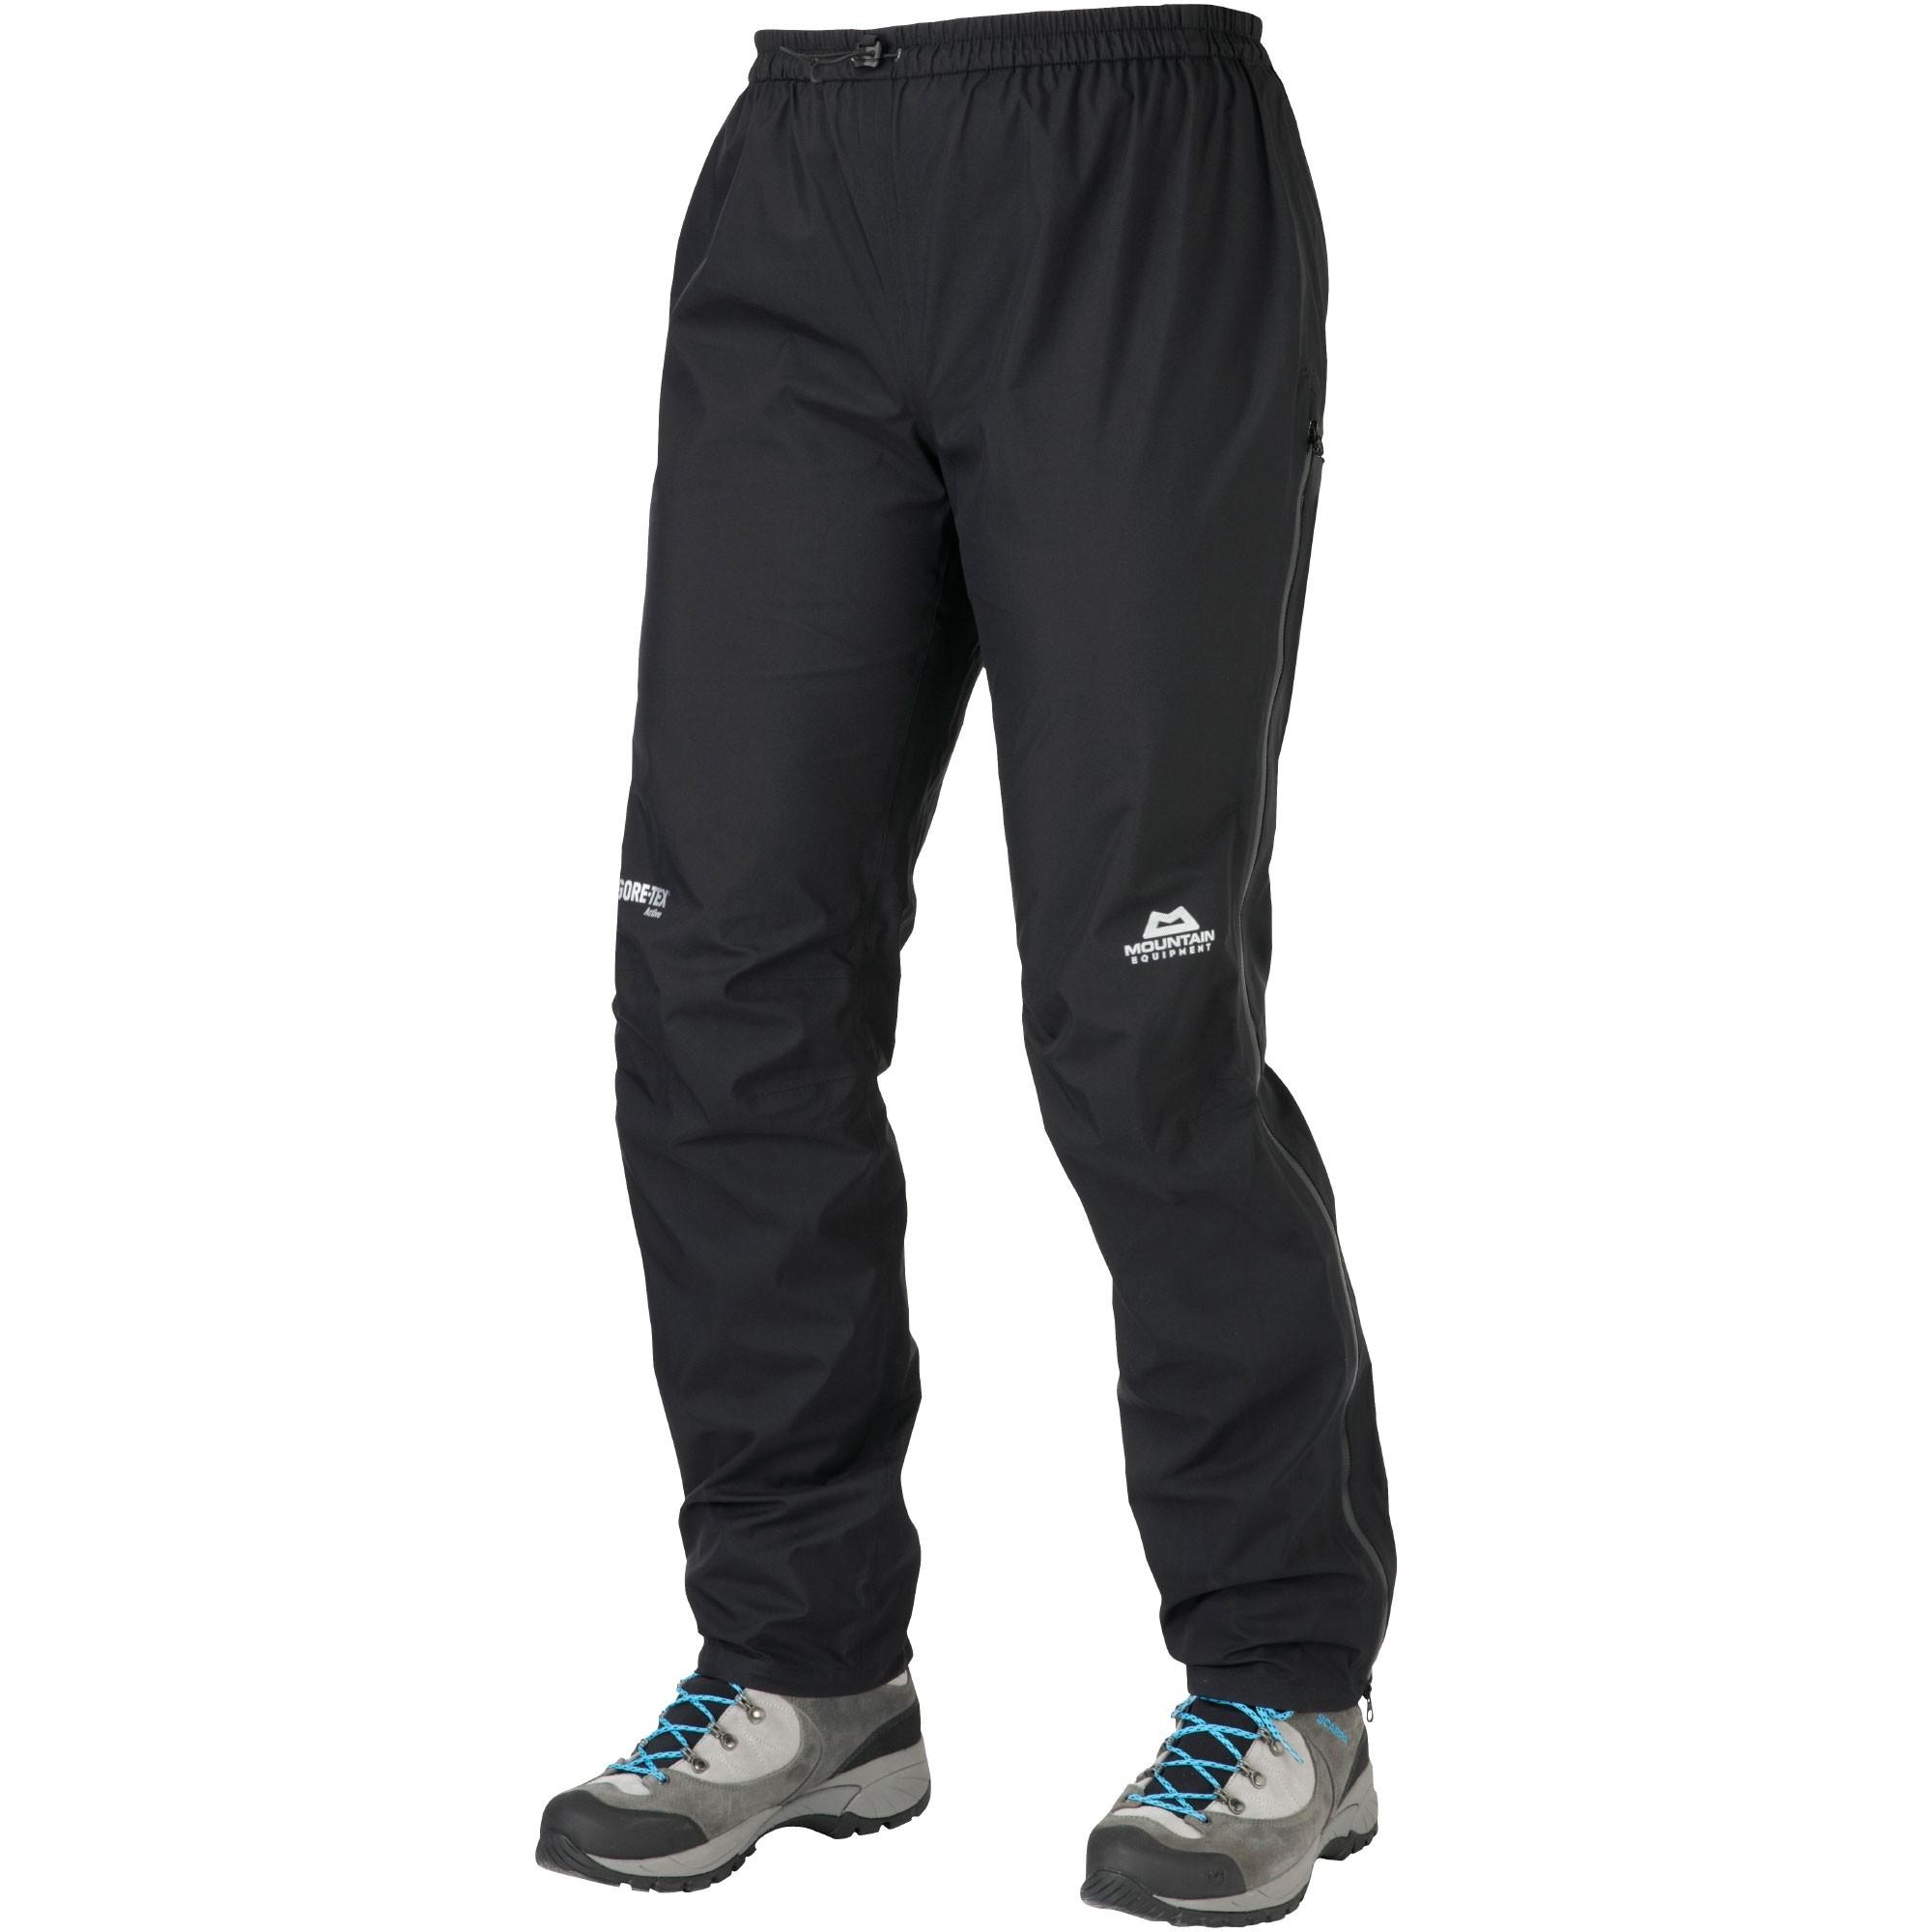 Mountain Equipment Women's Firefox Pants - Black